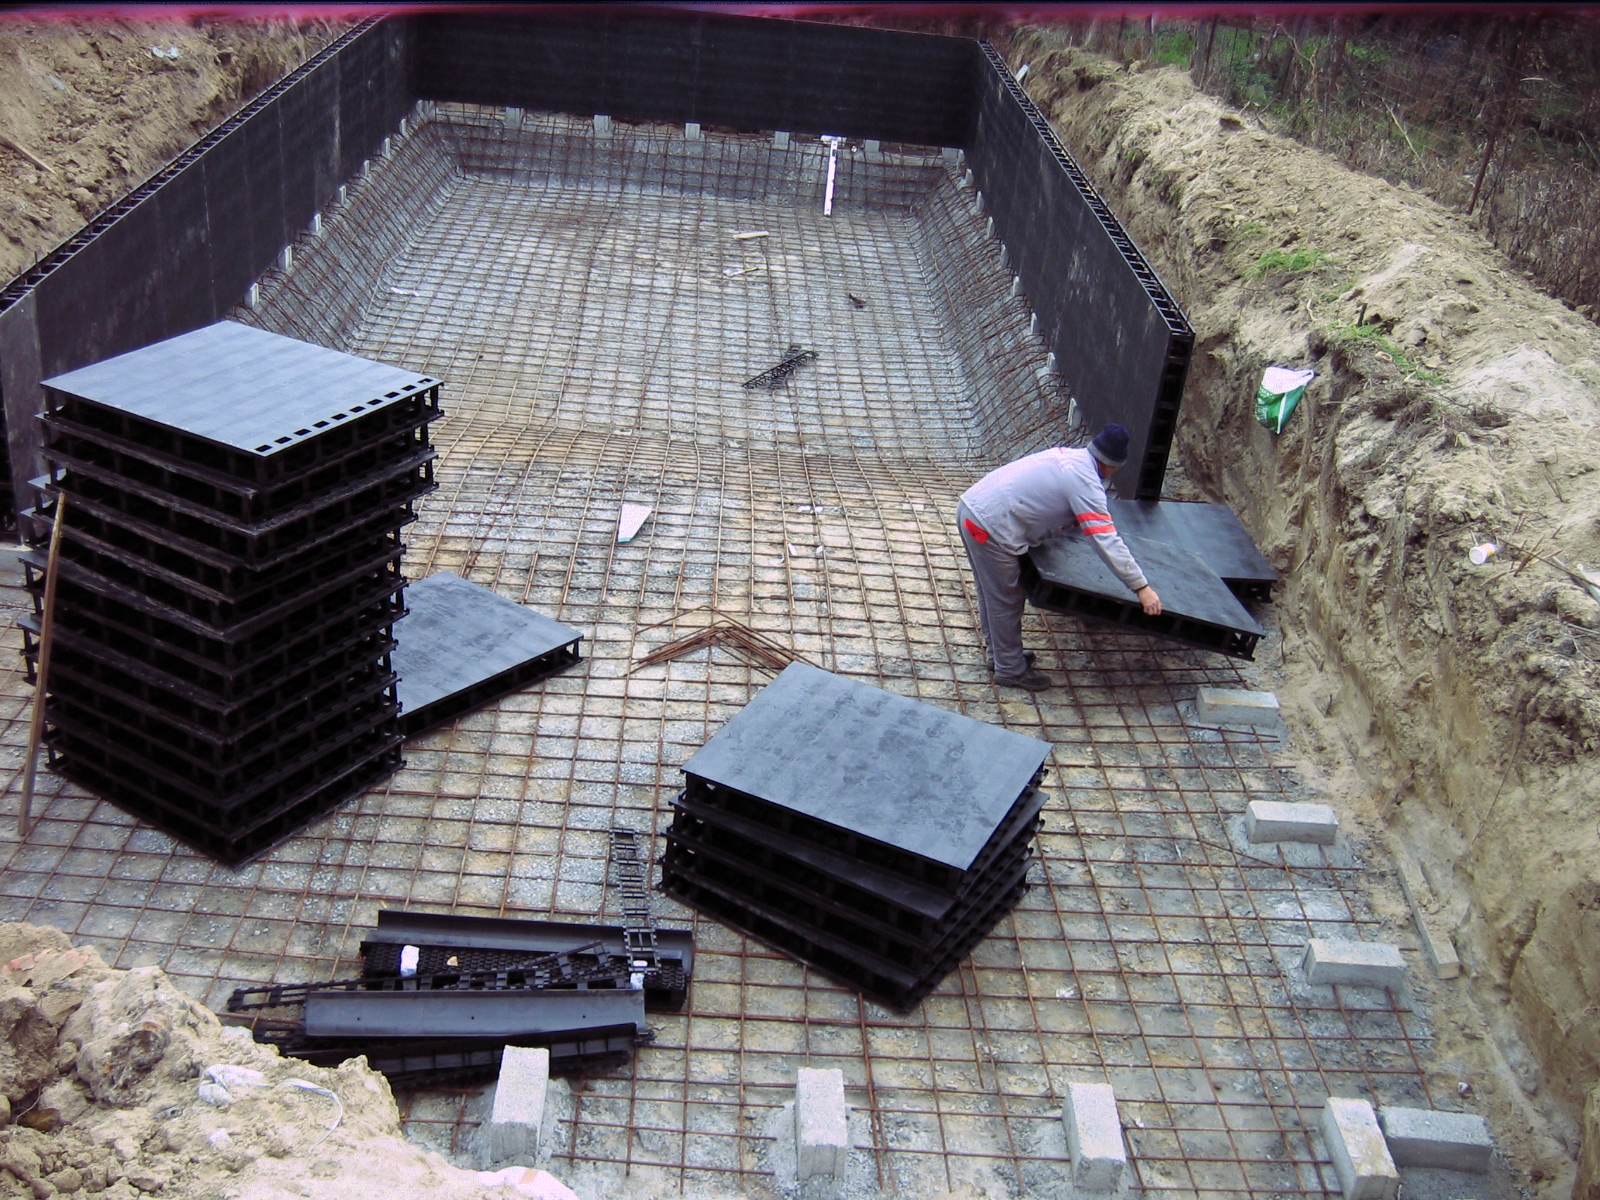 Piscina privata din beton cu cofrag pierdut - Faze montaj 2 MONDIAL PISCINE - Poza 2